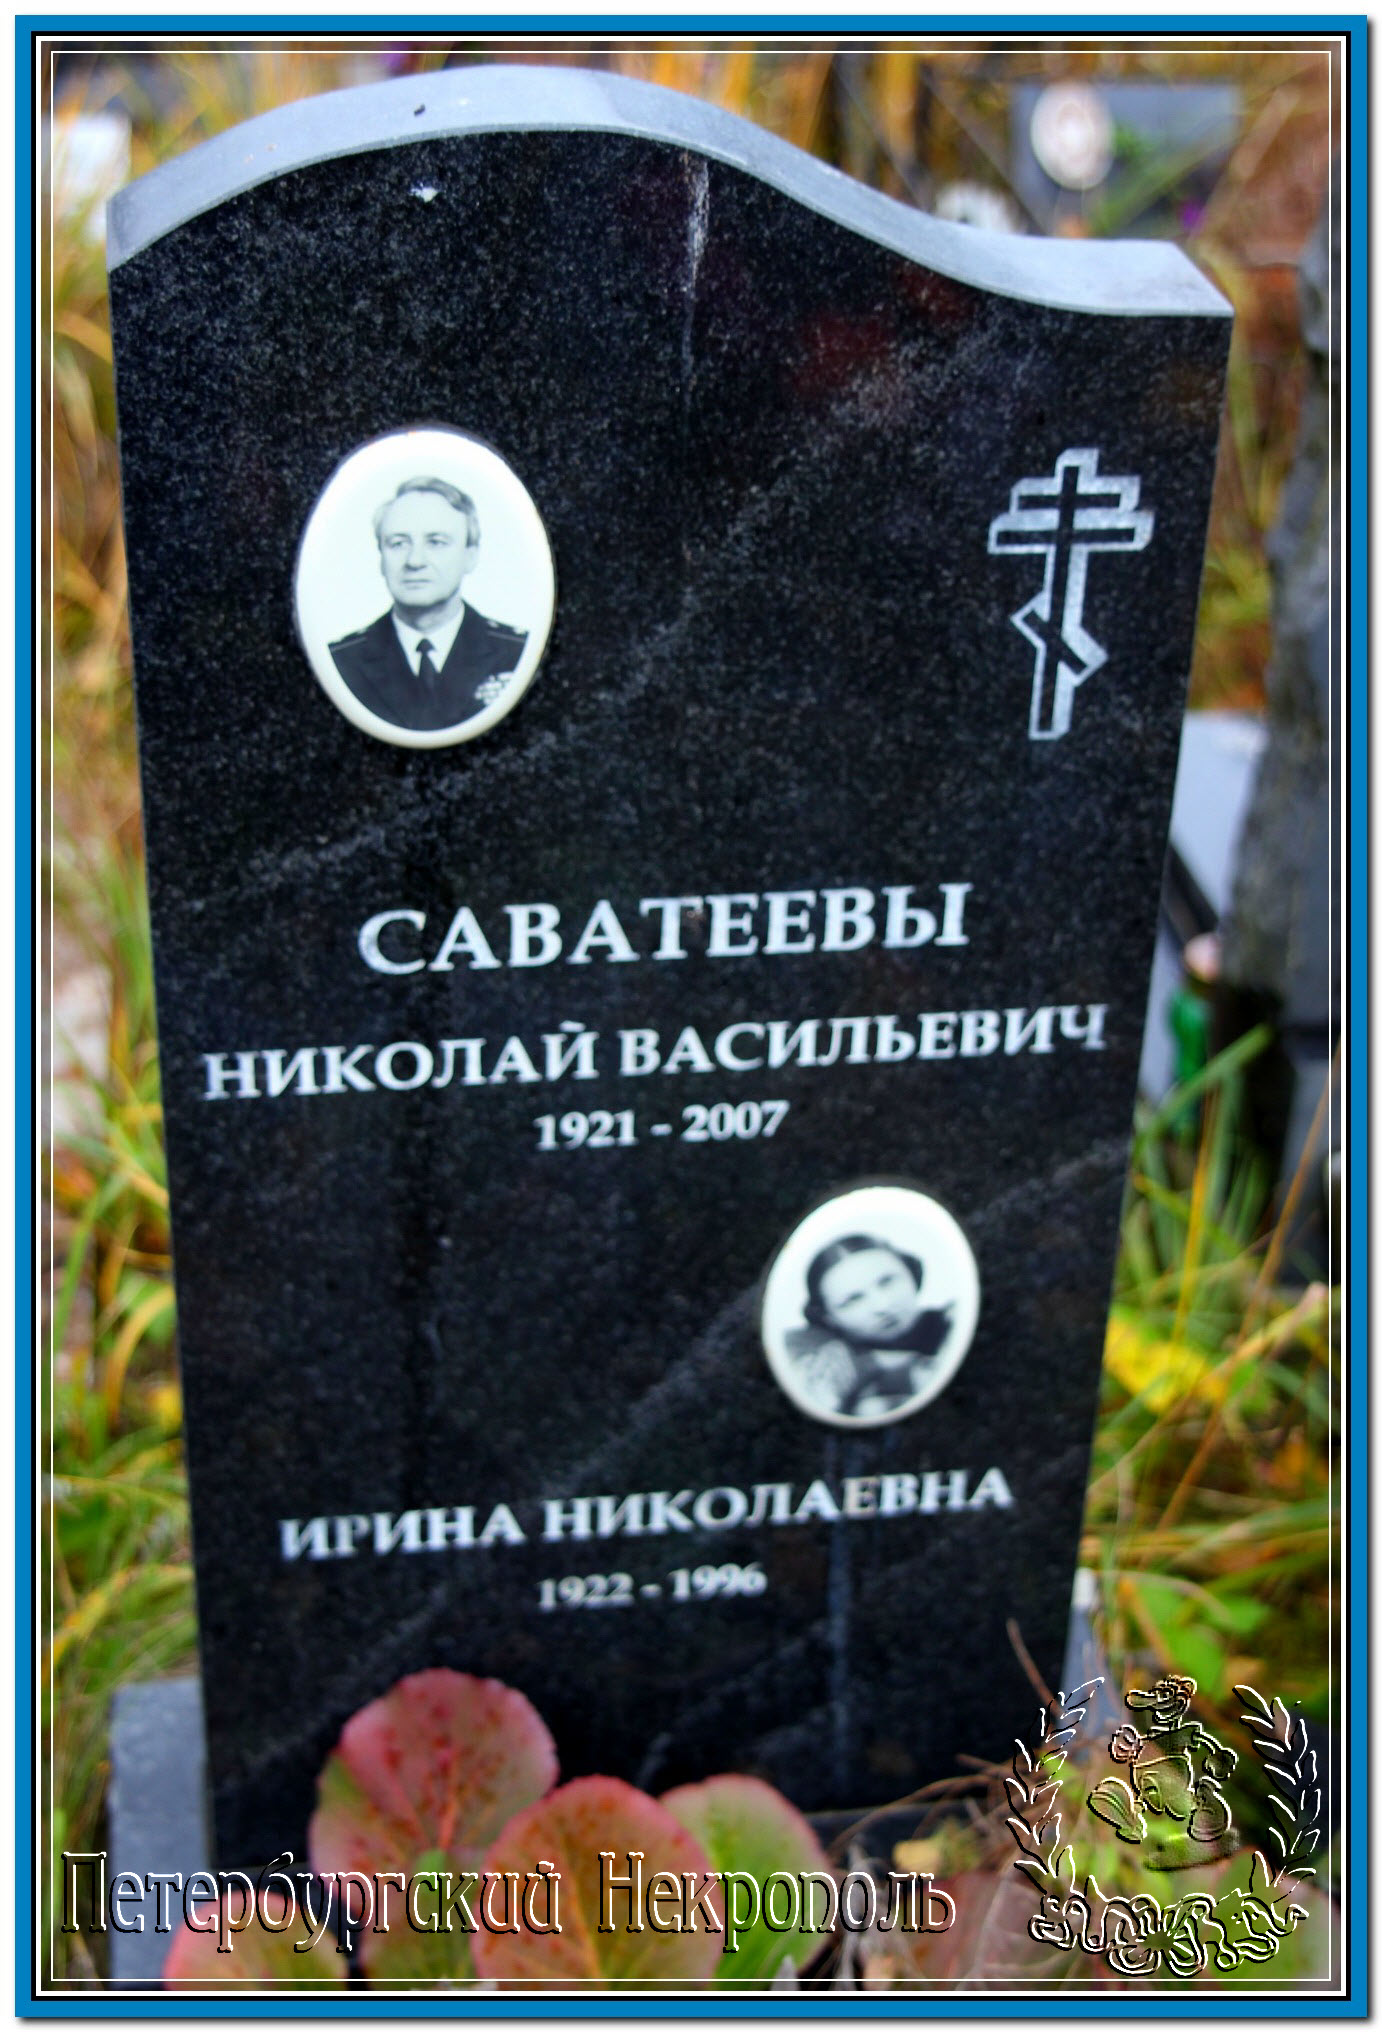 © Саватеев Николай Васильевич